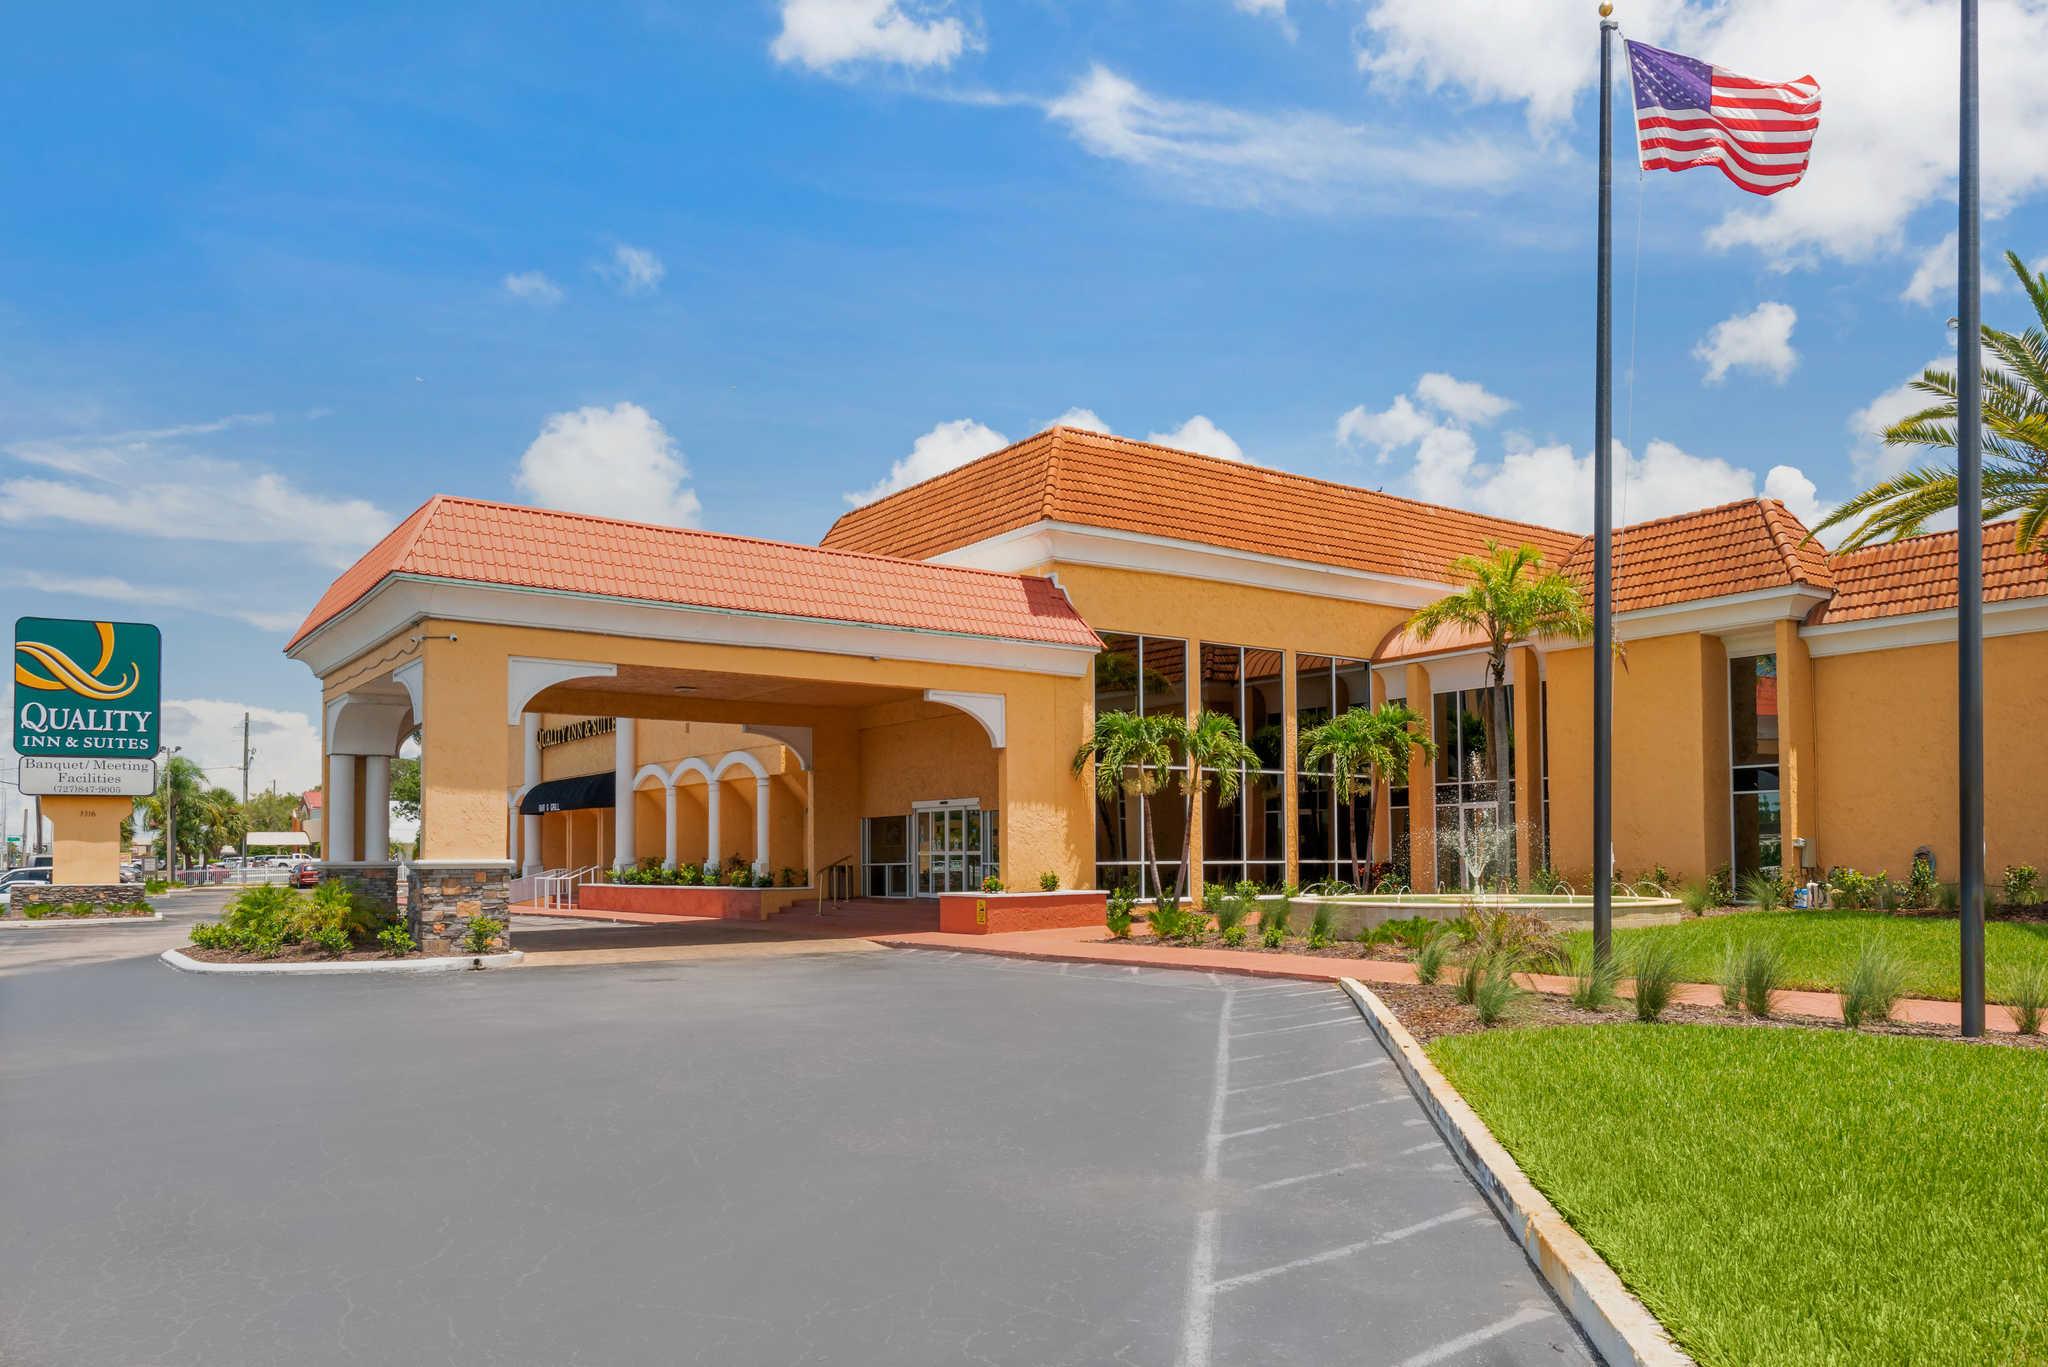 Quality Inn Suites Hotel In New Port Richey Fl